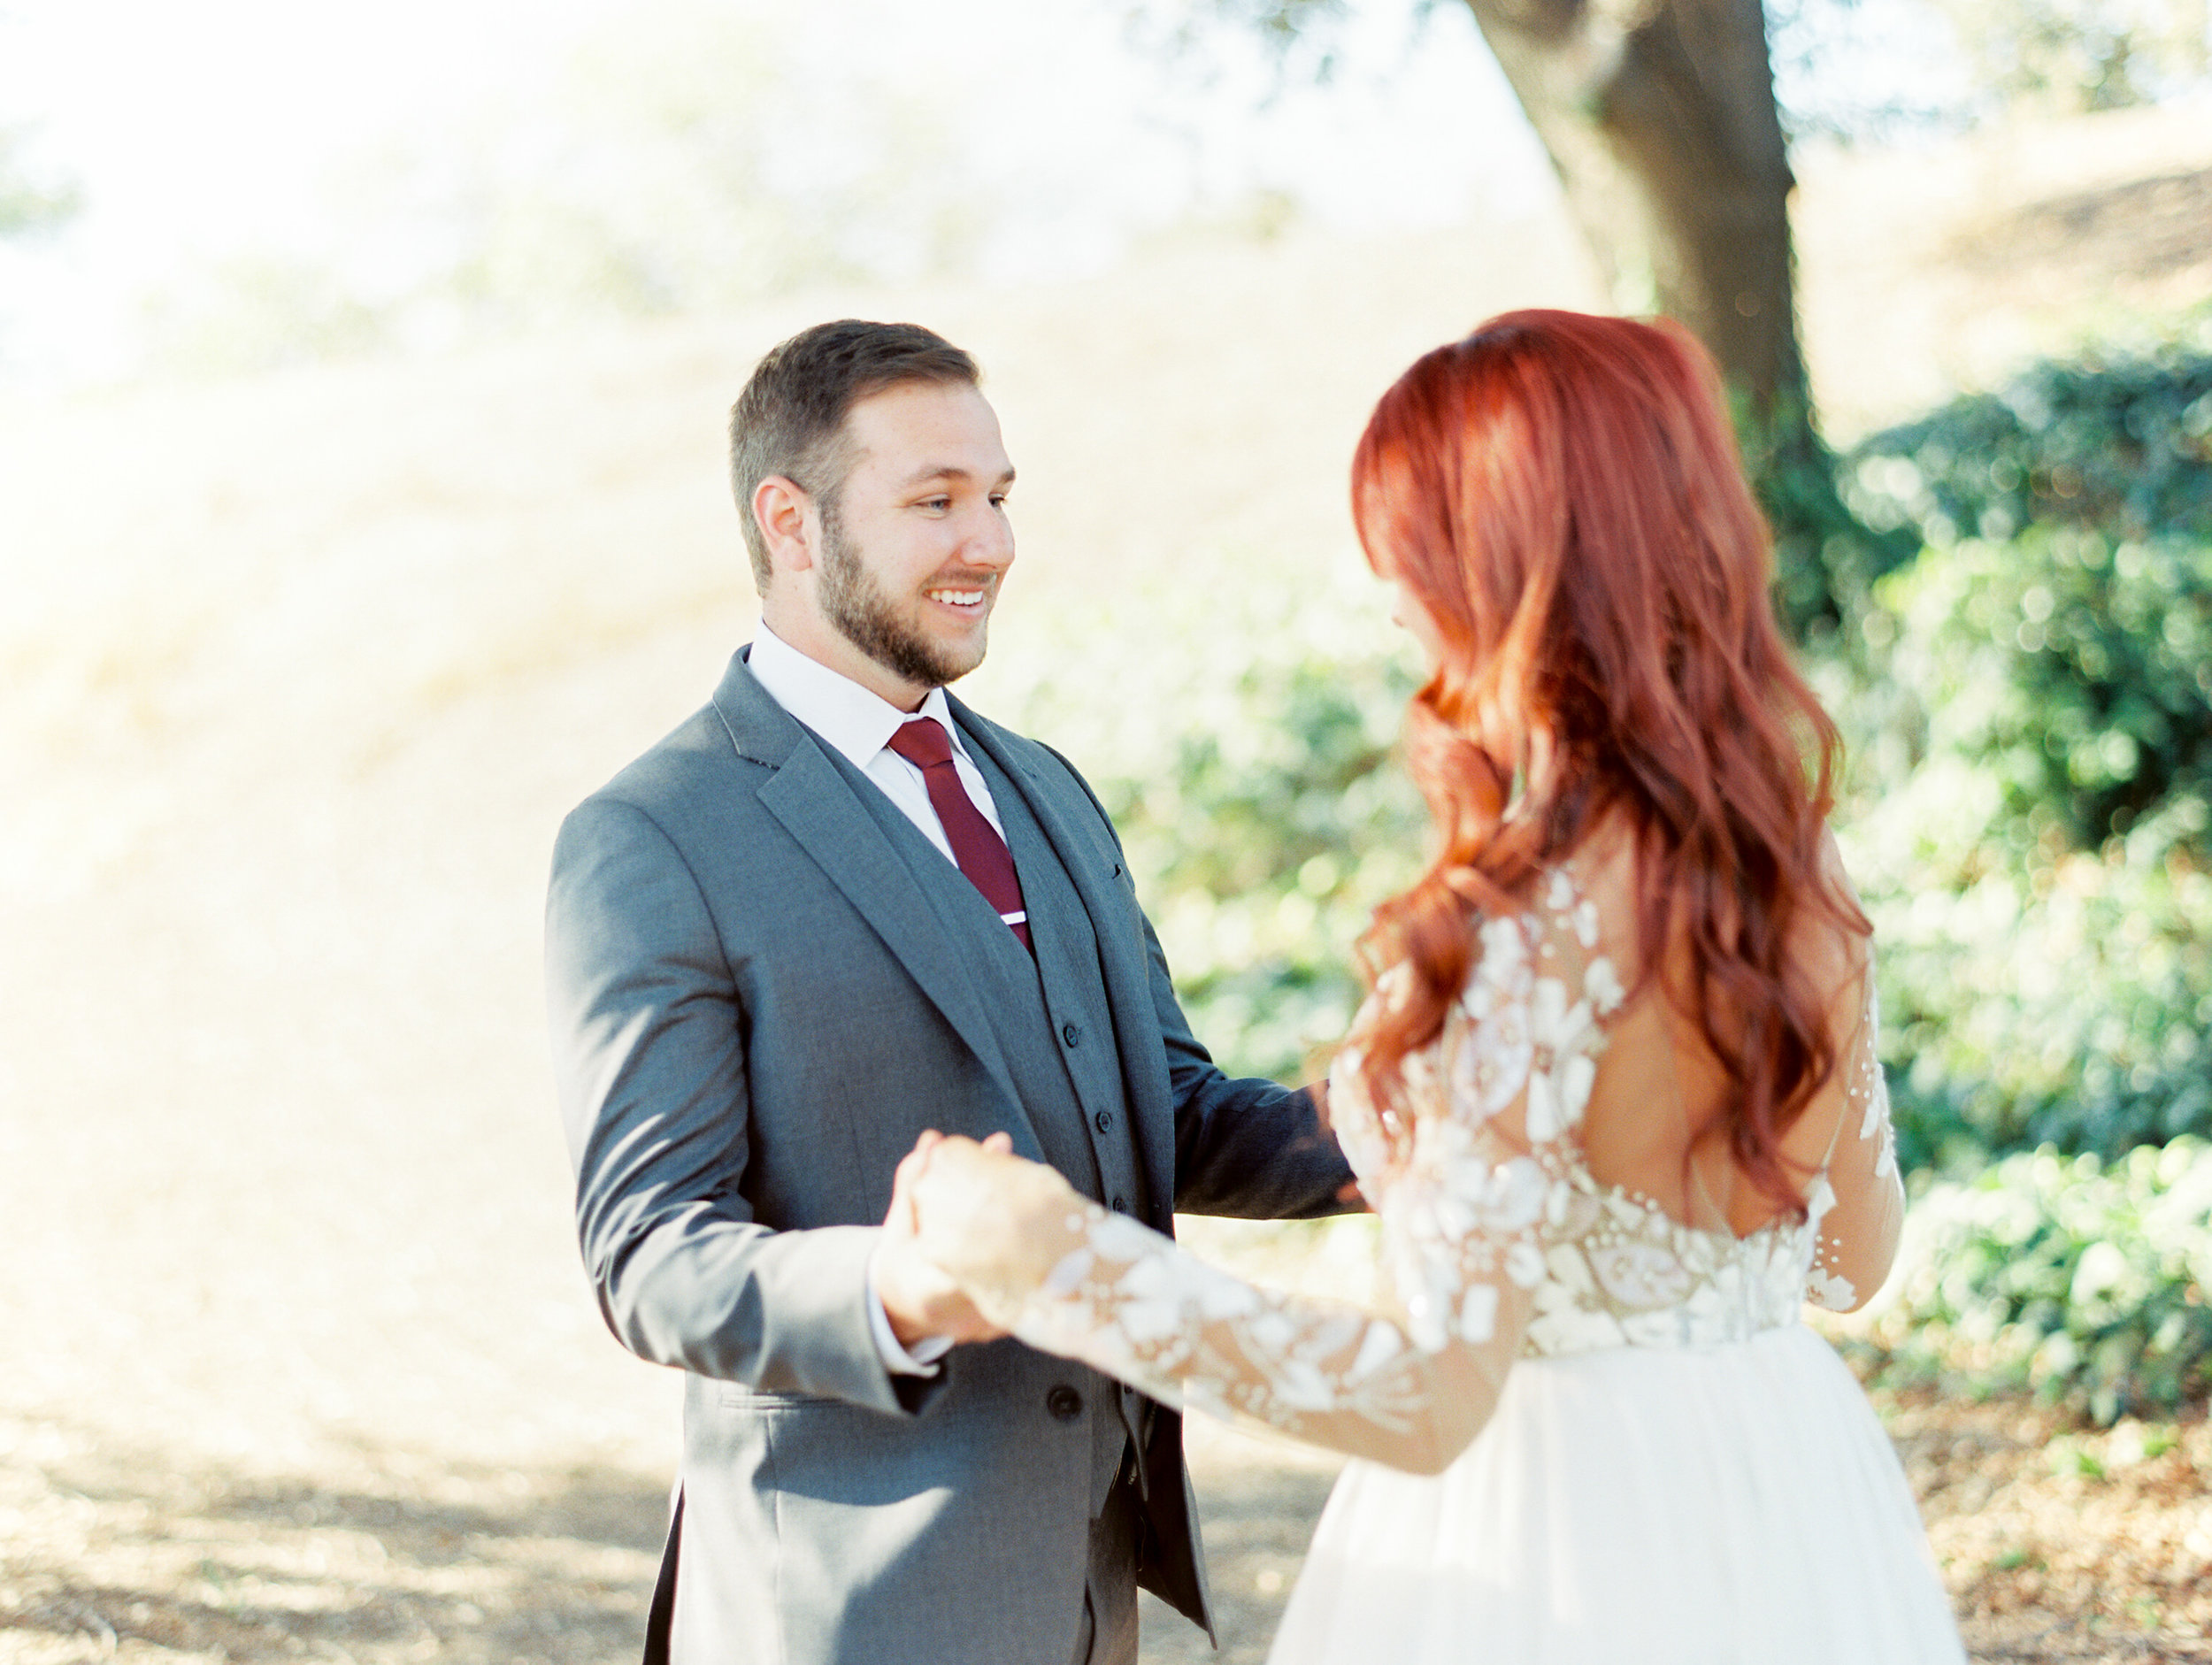 fall-inspired-wedding-at-scribner-bend-vineyards-in-sacramento-california-1-5.jpg